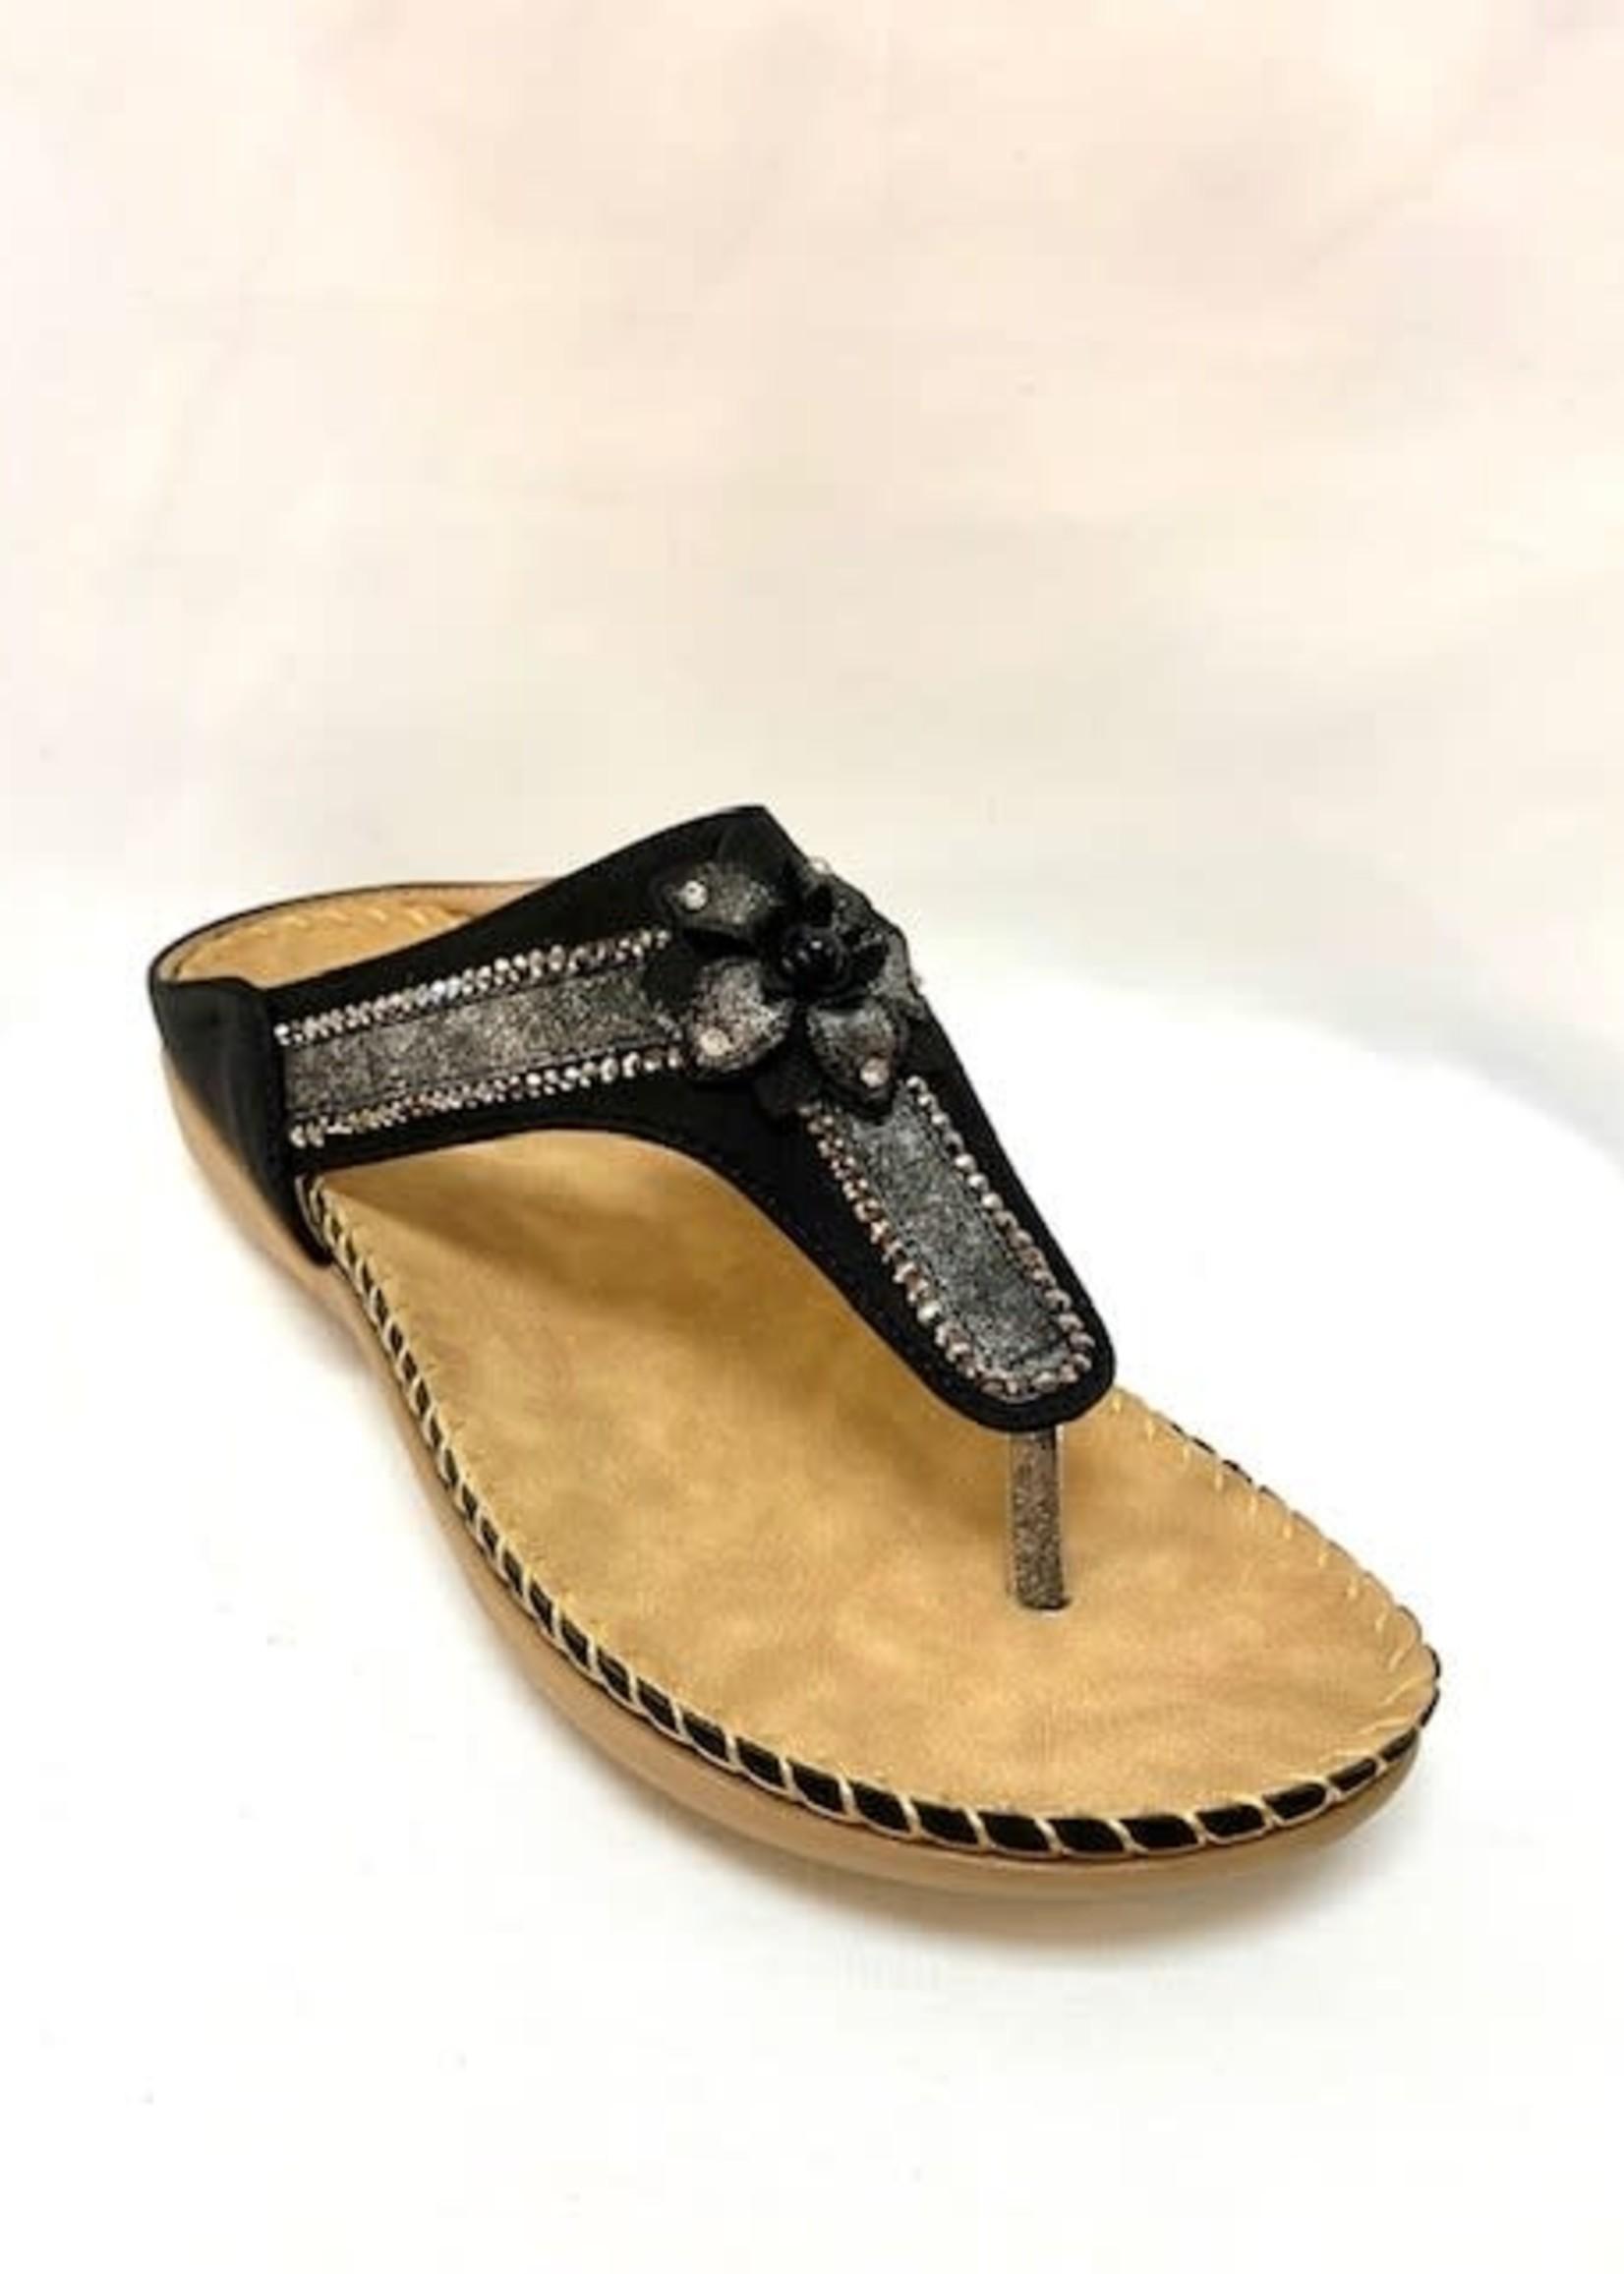 JJ Thong sandals, three variant colors